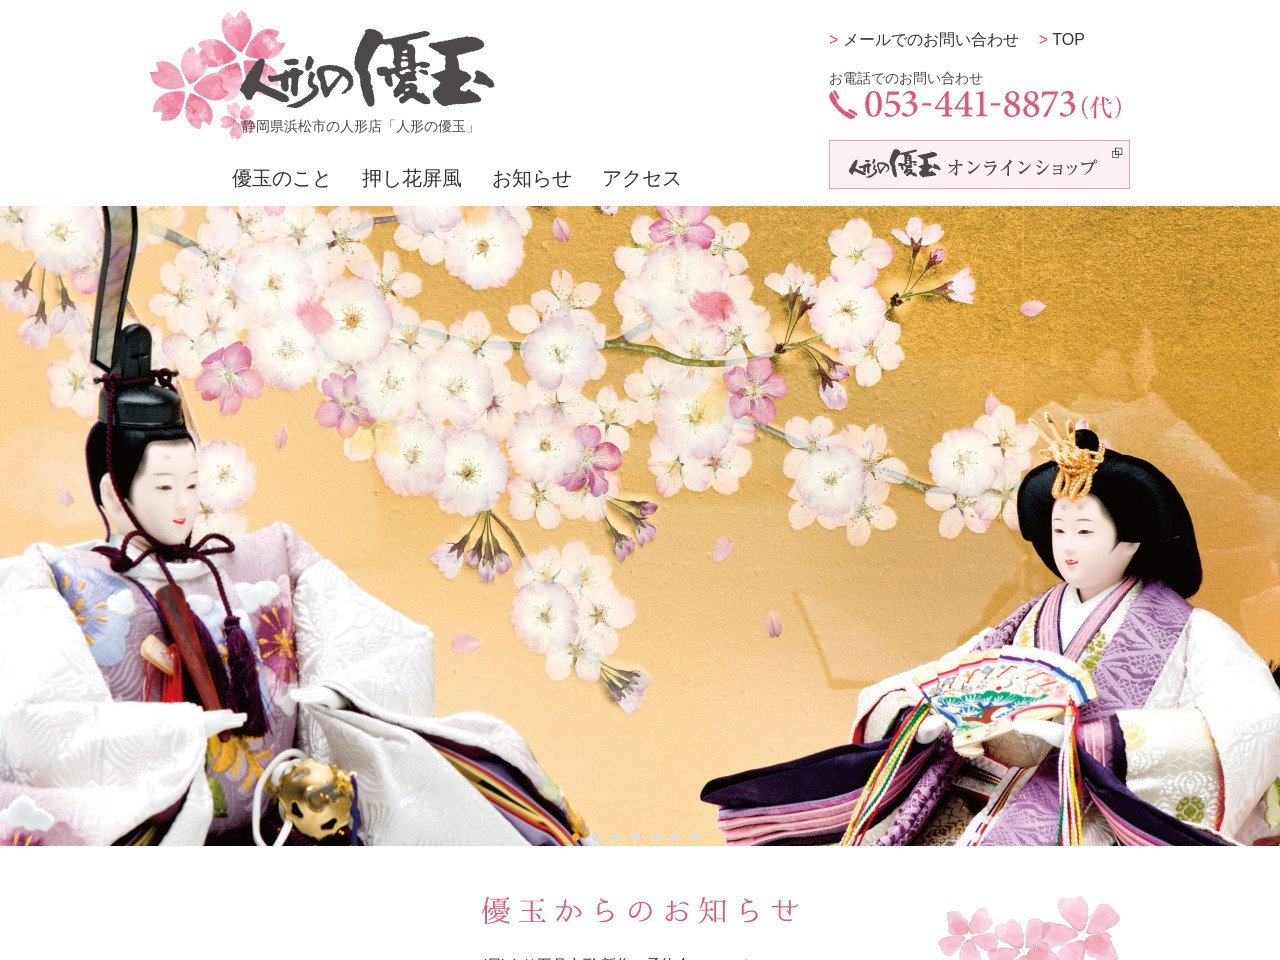 人形の優玉 - 静岡県浜松市の人形店